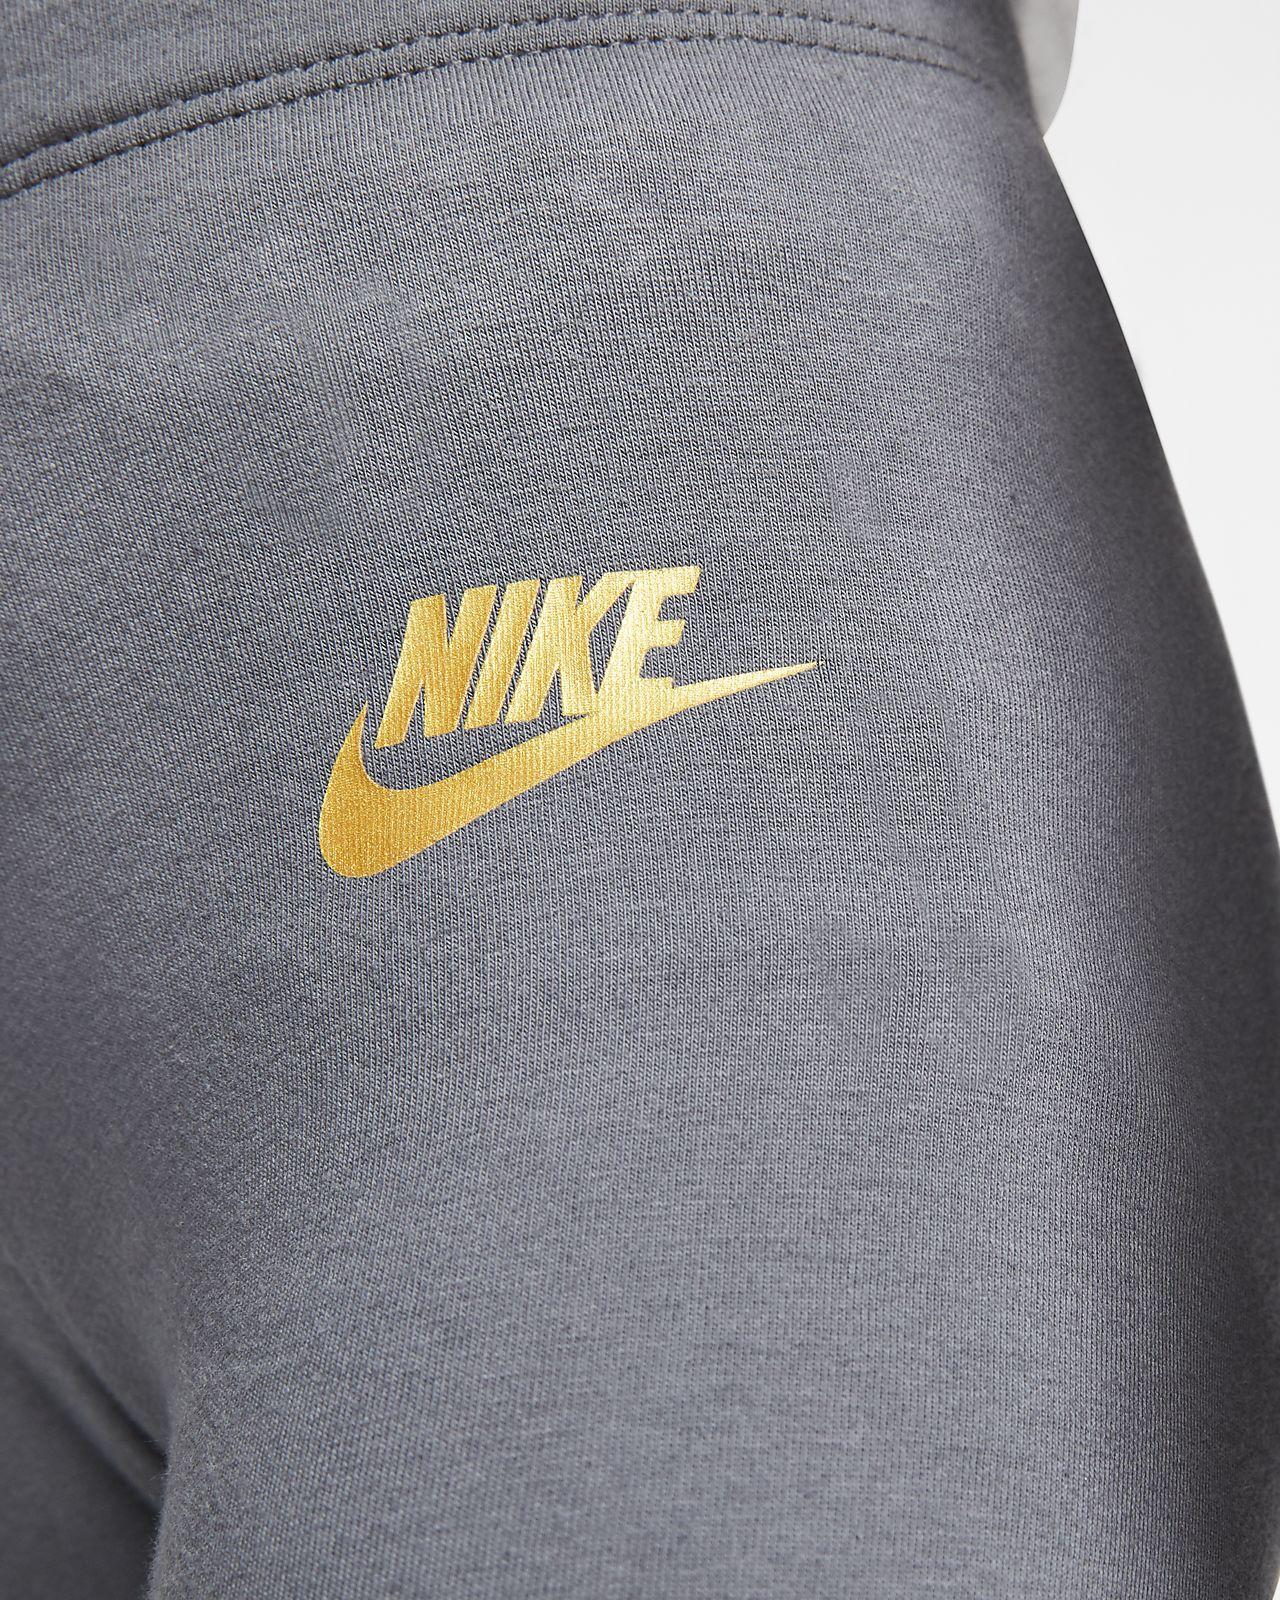 0d9f26408c5 Nike Sportswear Air-leggings til små børn. Nike.com DK